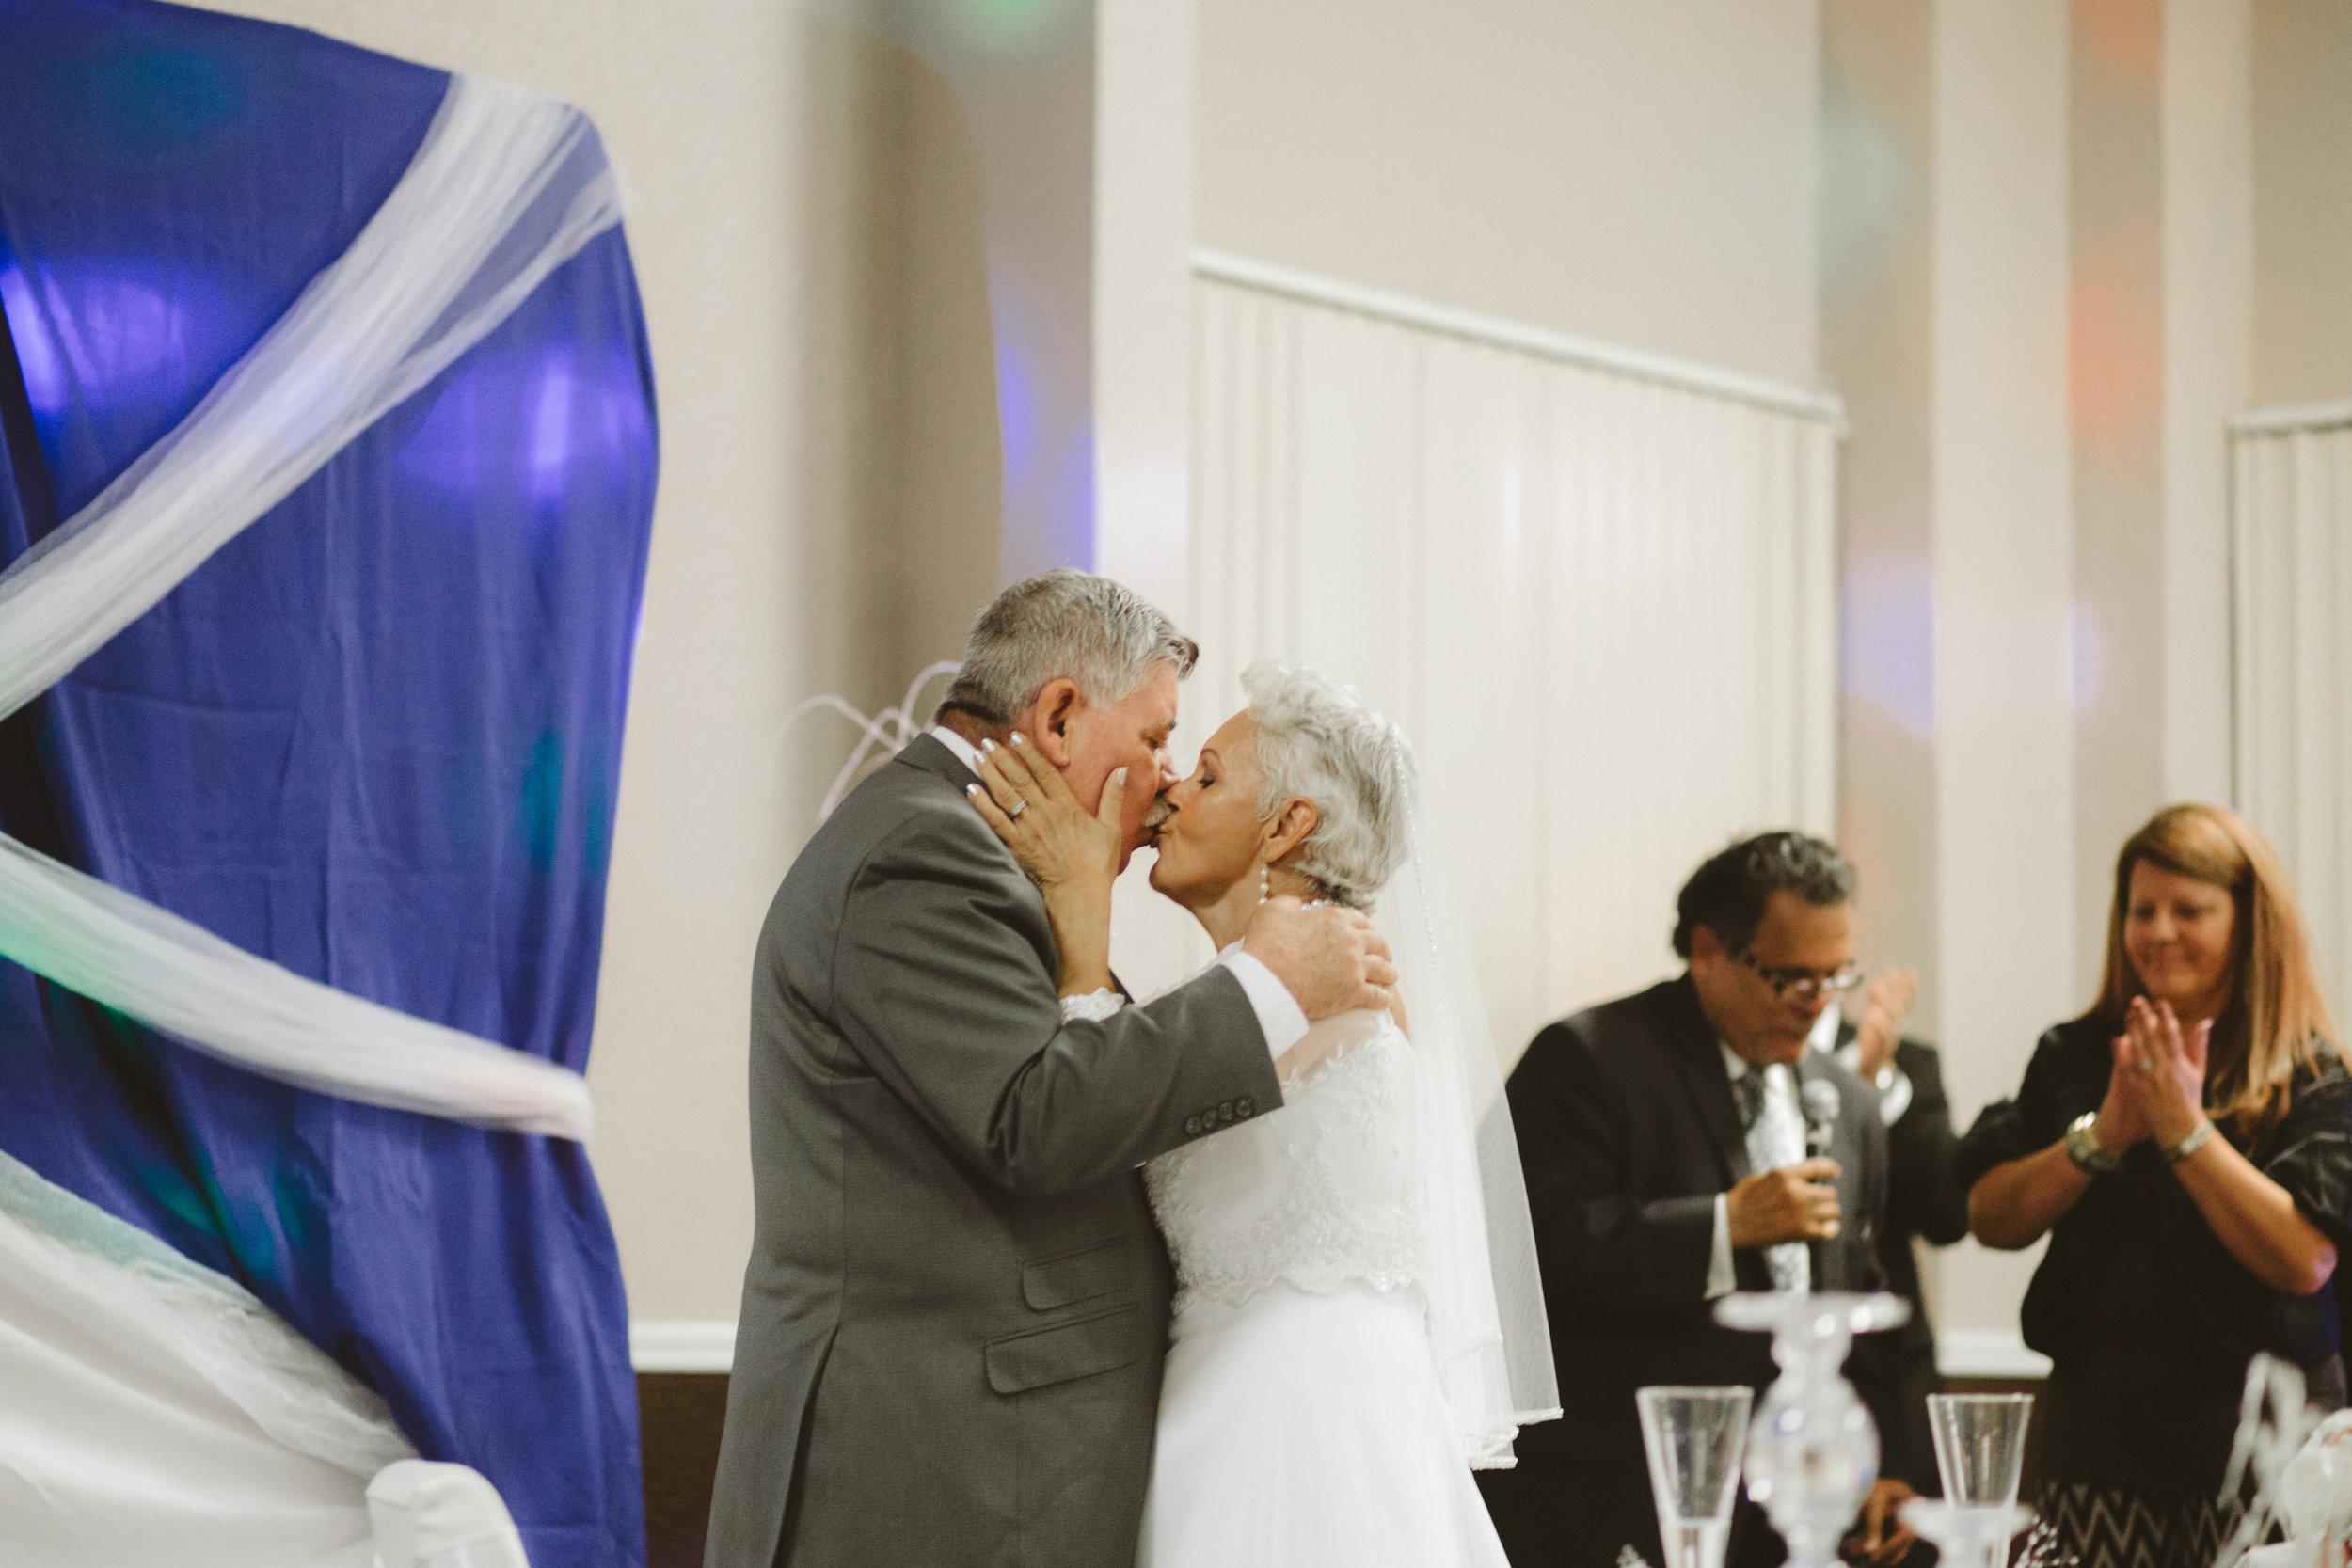 wedding | Vanessa Boy Photography | vanessaboy.com |-319.jpg